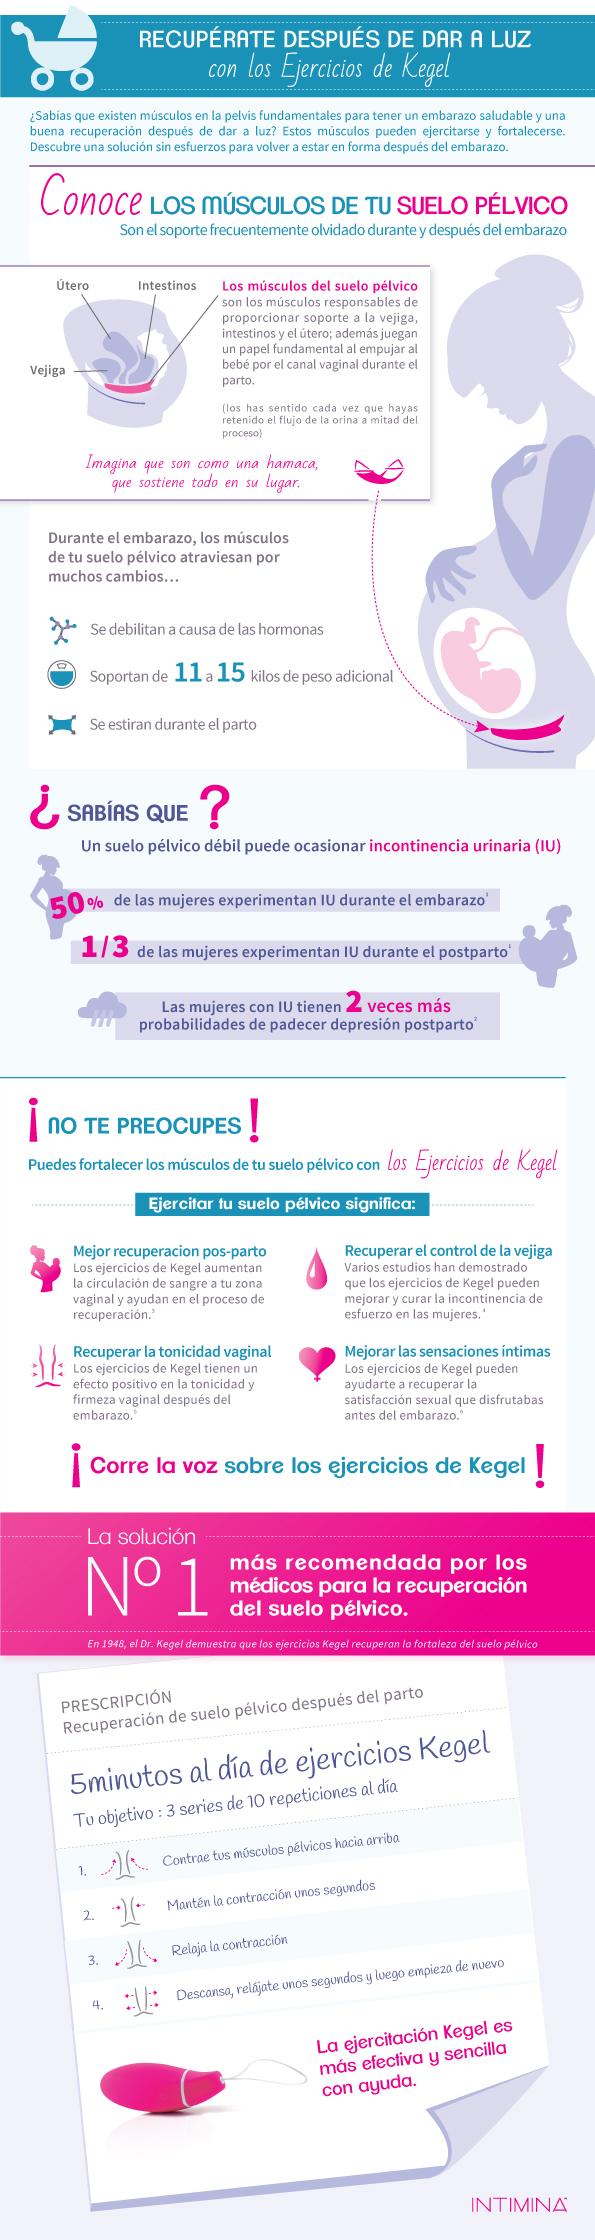 novedades_kegelsmart_infografia_recuperate_dar_a_luz_ejercicios_kegel